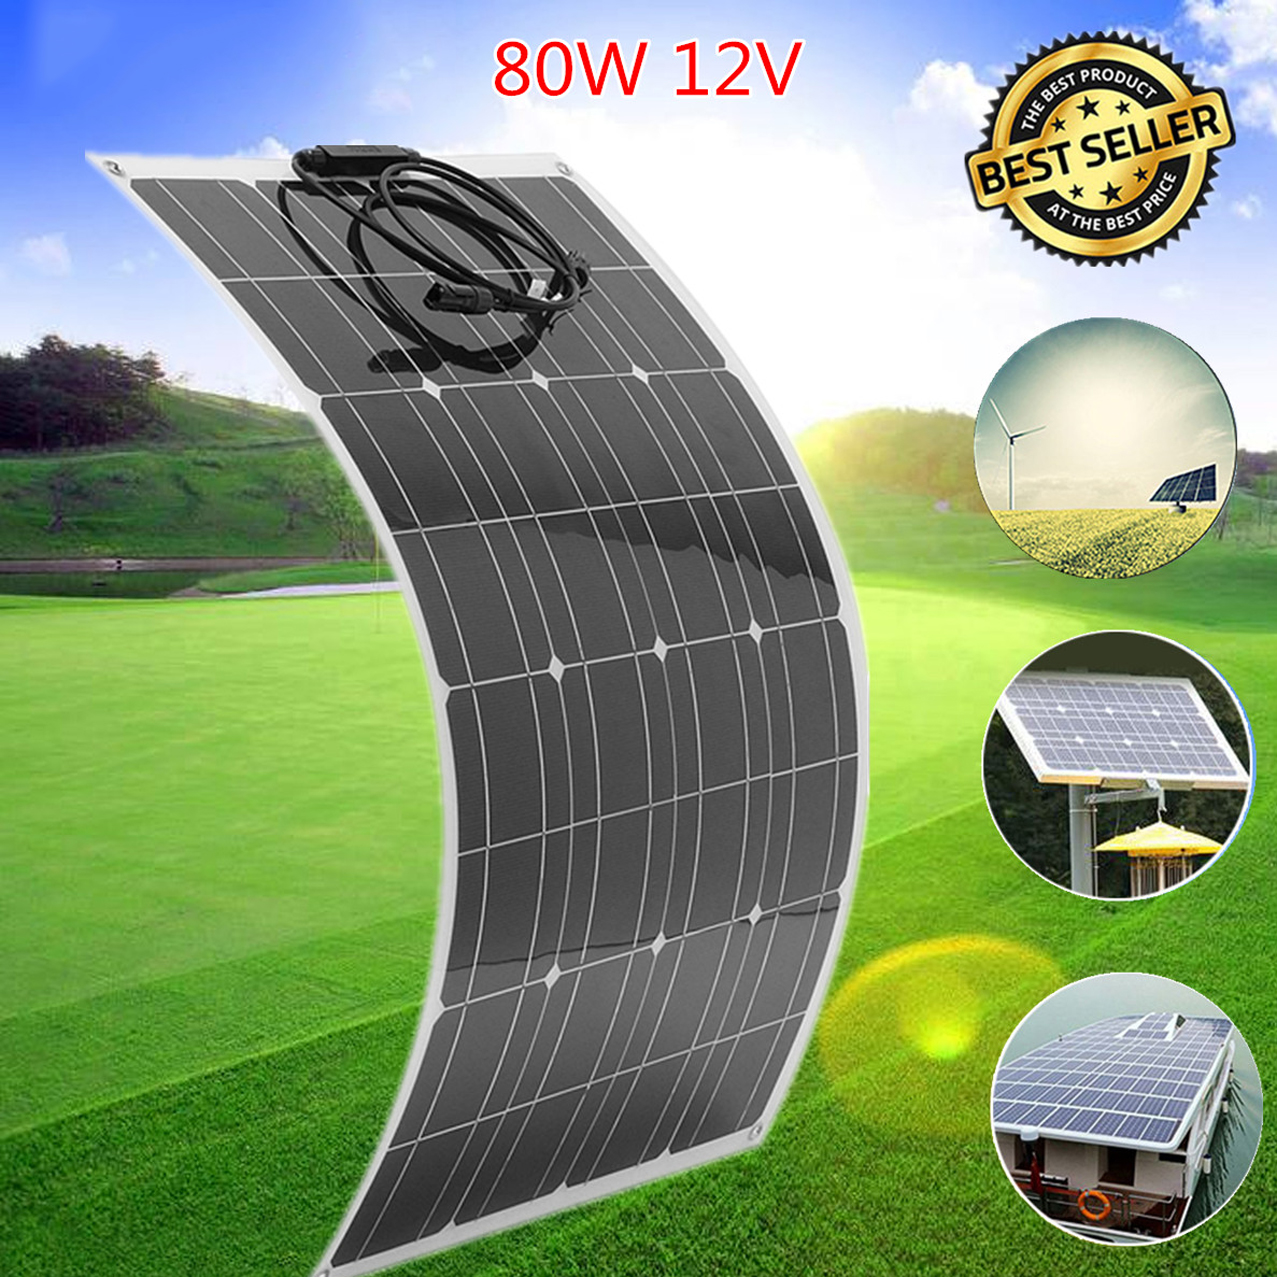 цены на LEORY Flexible Solar Panel Plate 80W 18V Solar Charger For Car Battery 12V Sunpower Monocrystalline Silicon Cells Module Kit